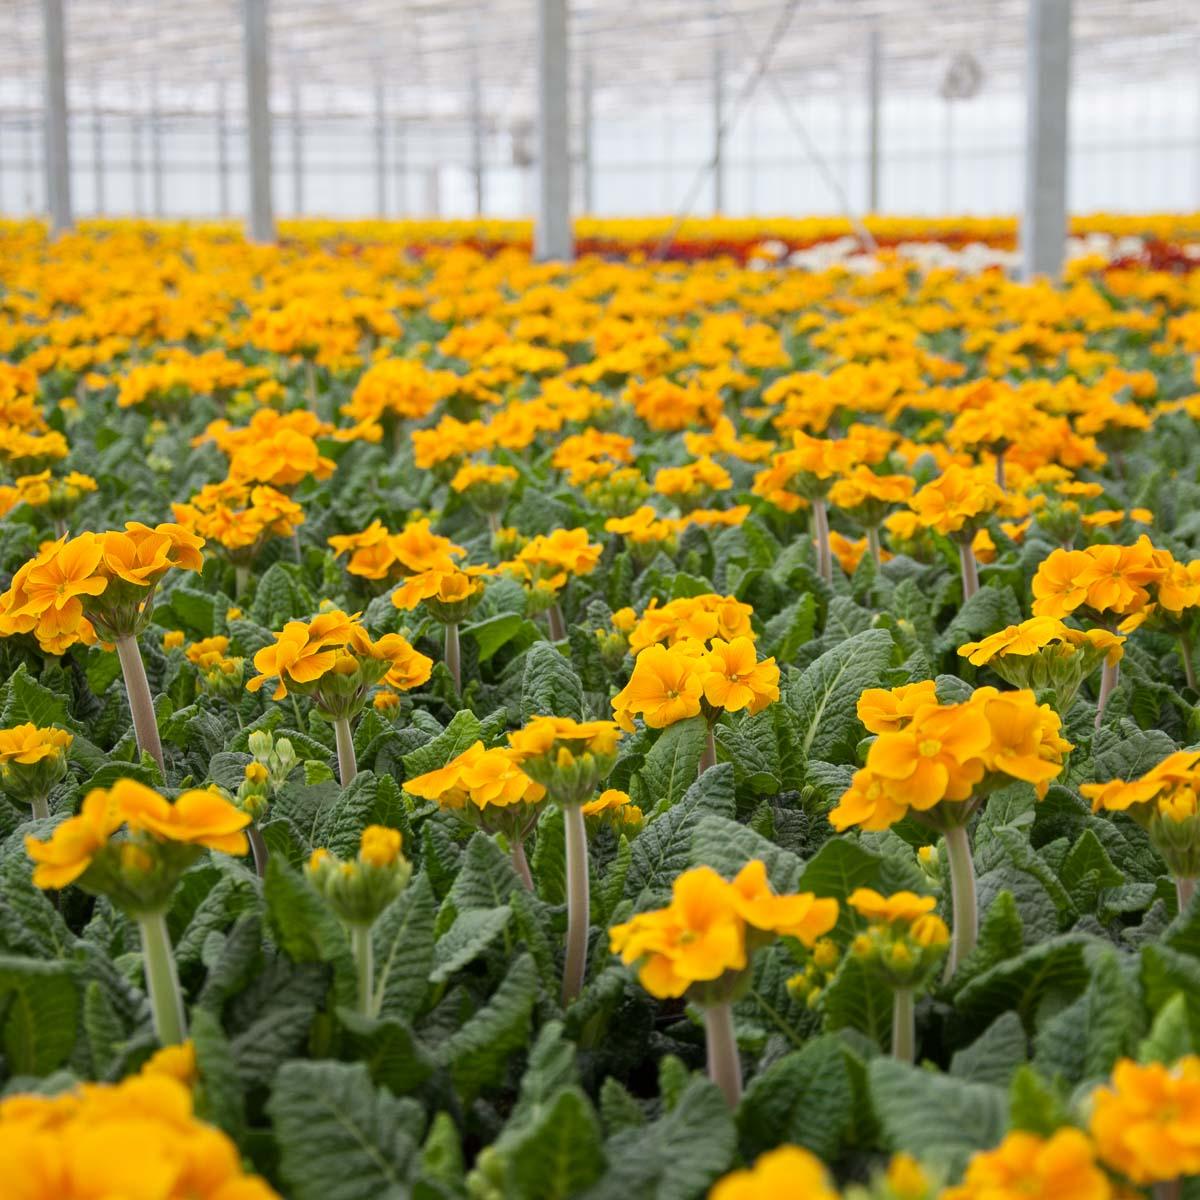 Dechant Gartenbau Betriebsansicht